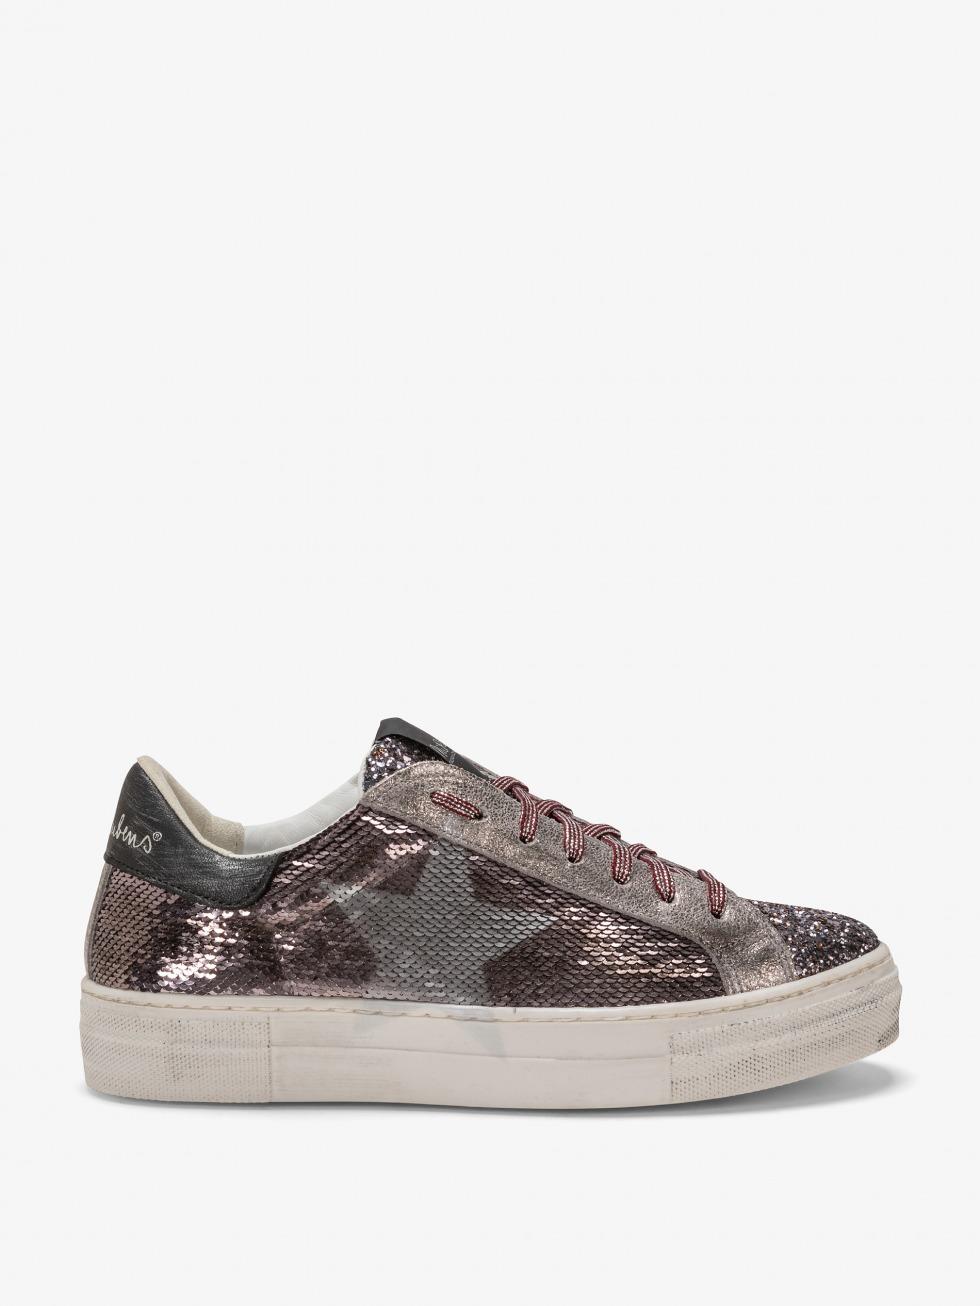 Martini Sparkle Sneakers - Grey Star